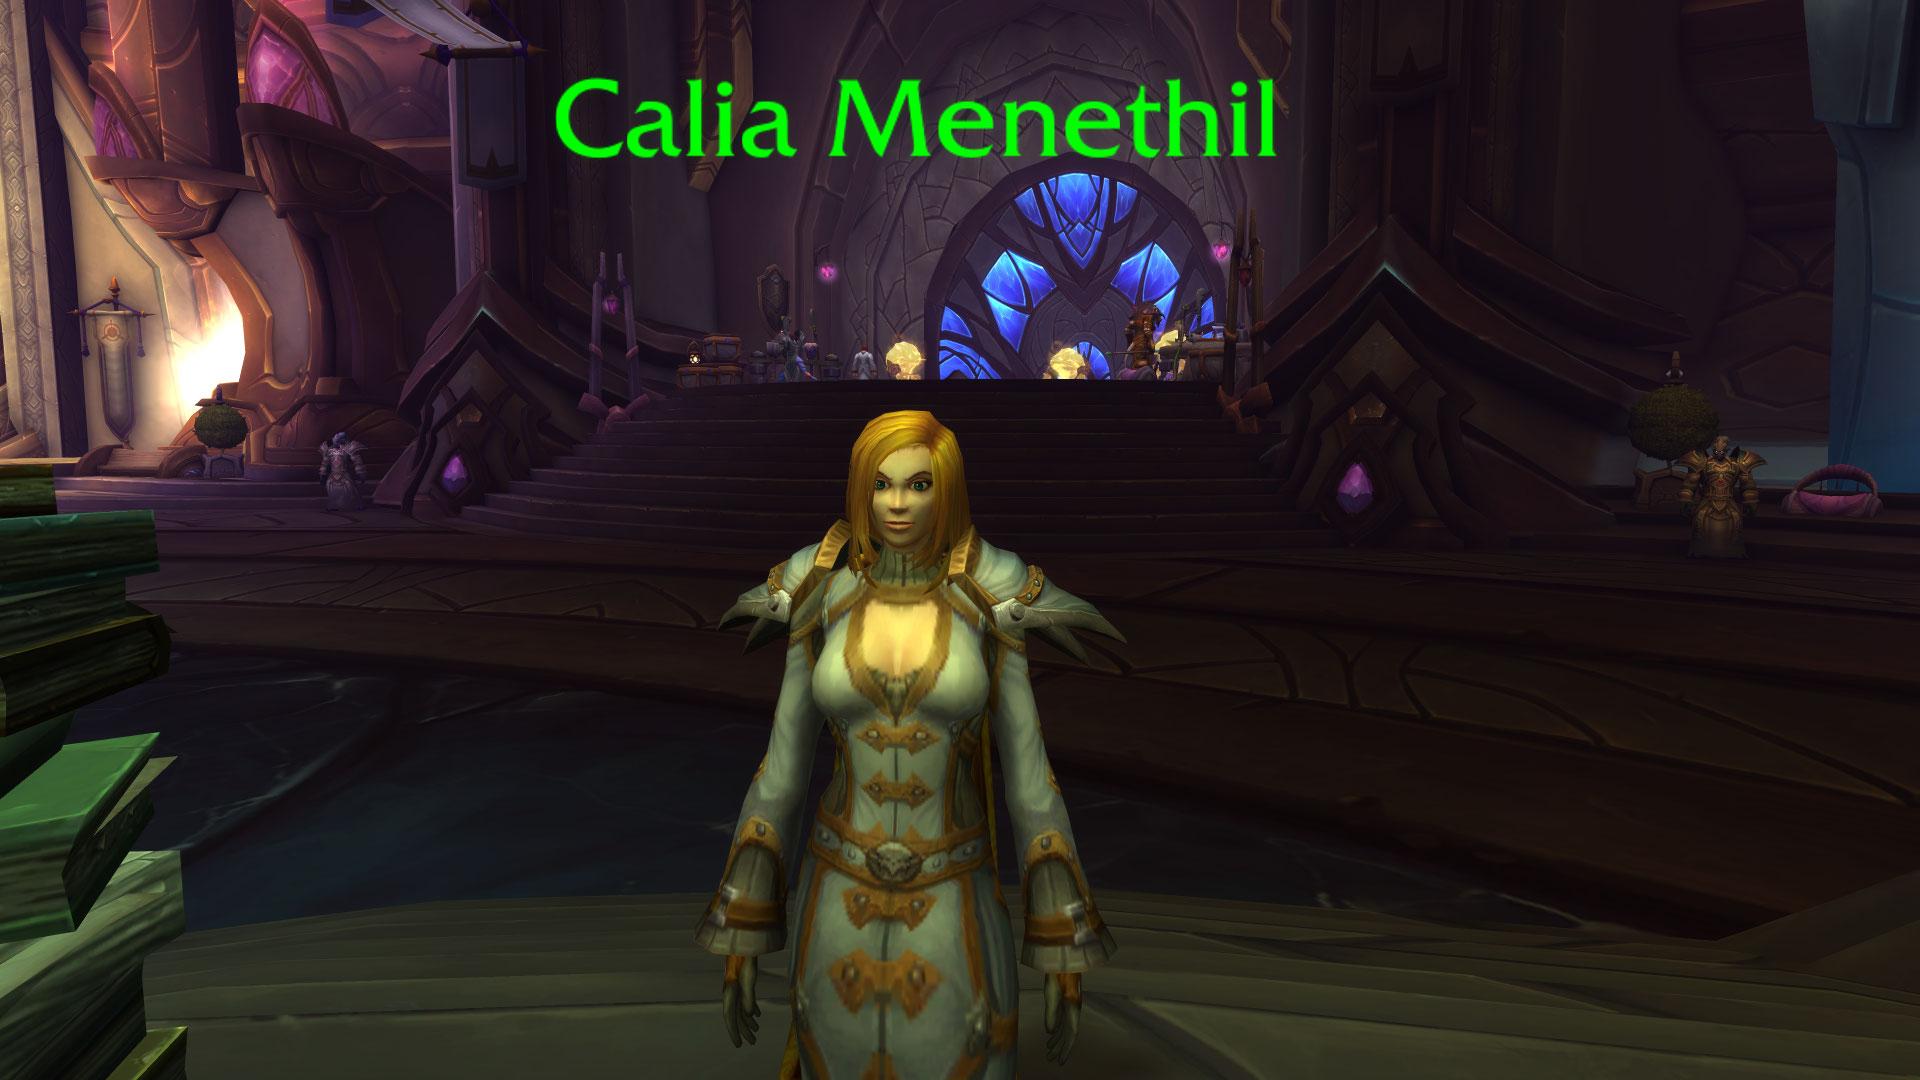 WoW Calia Menethil